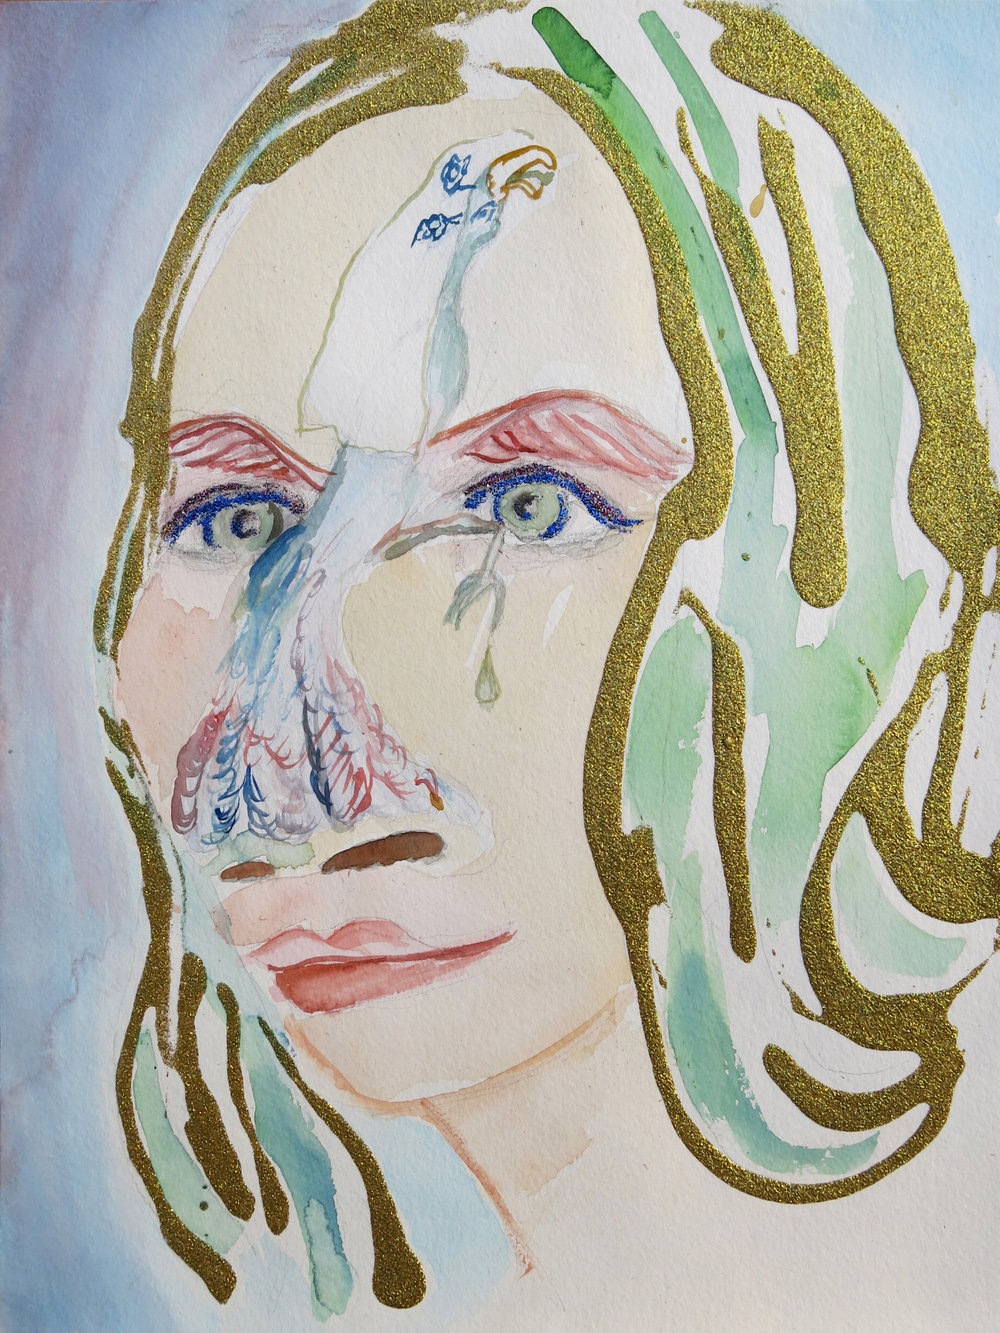 Barbra Streisand Portrait #23